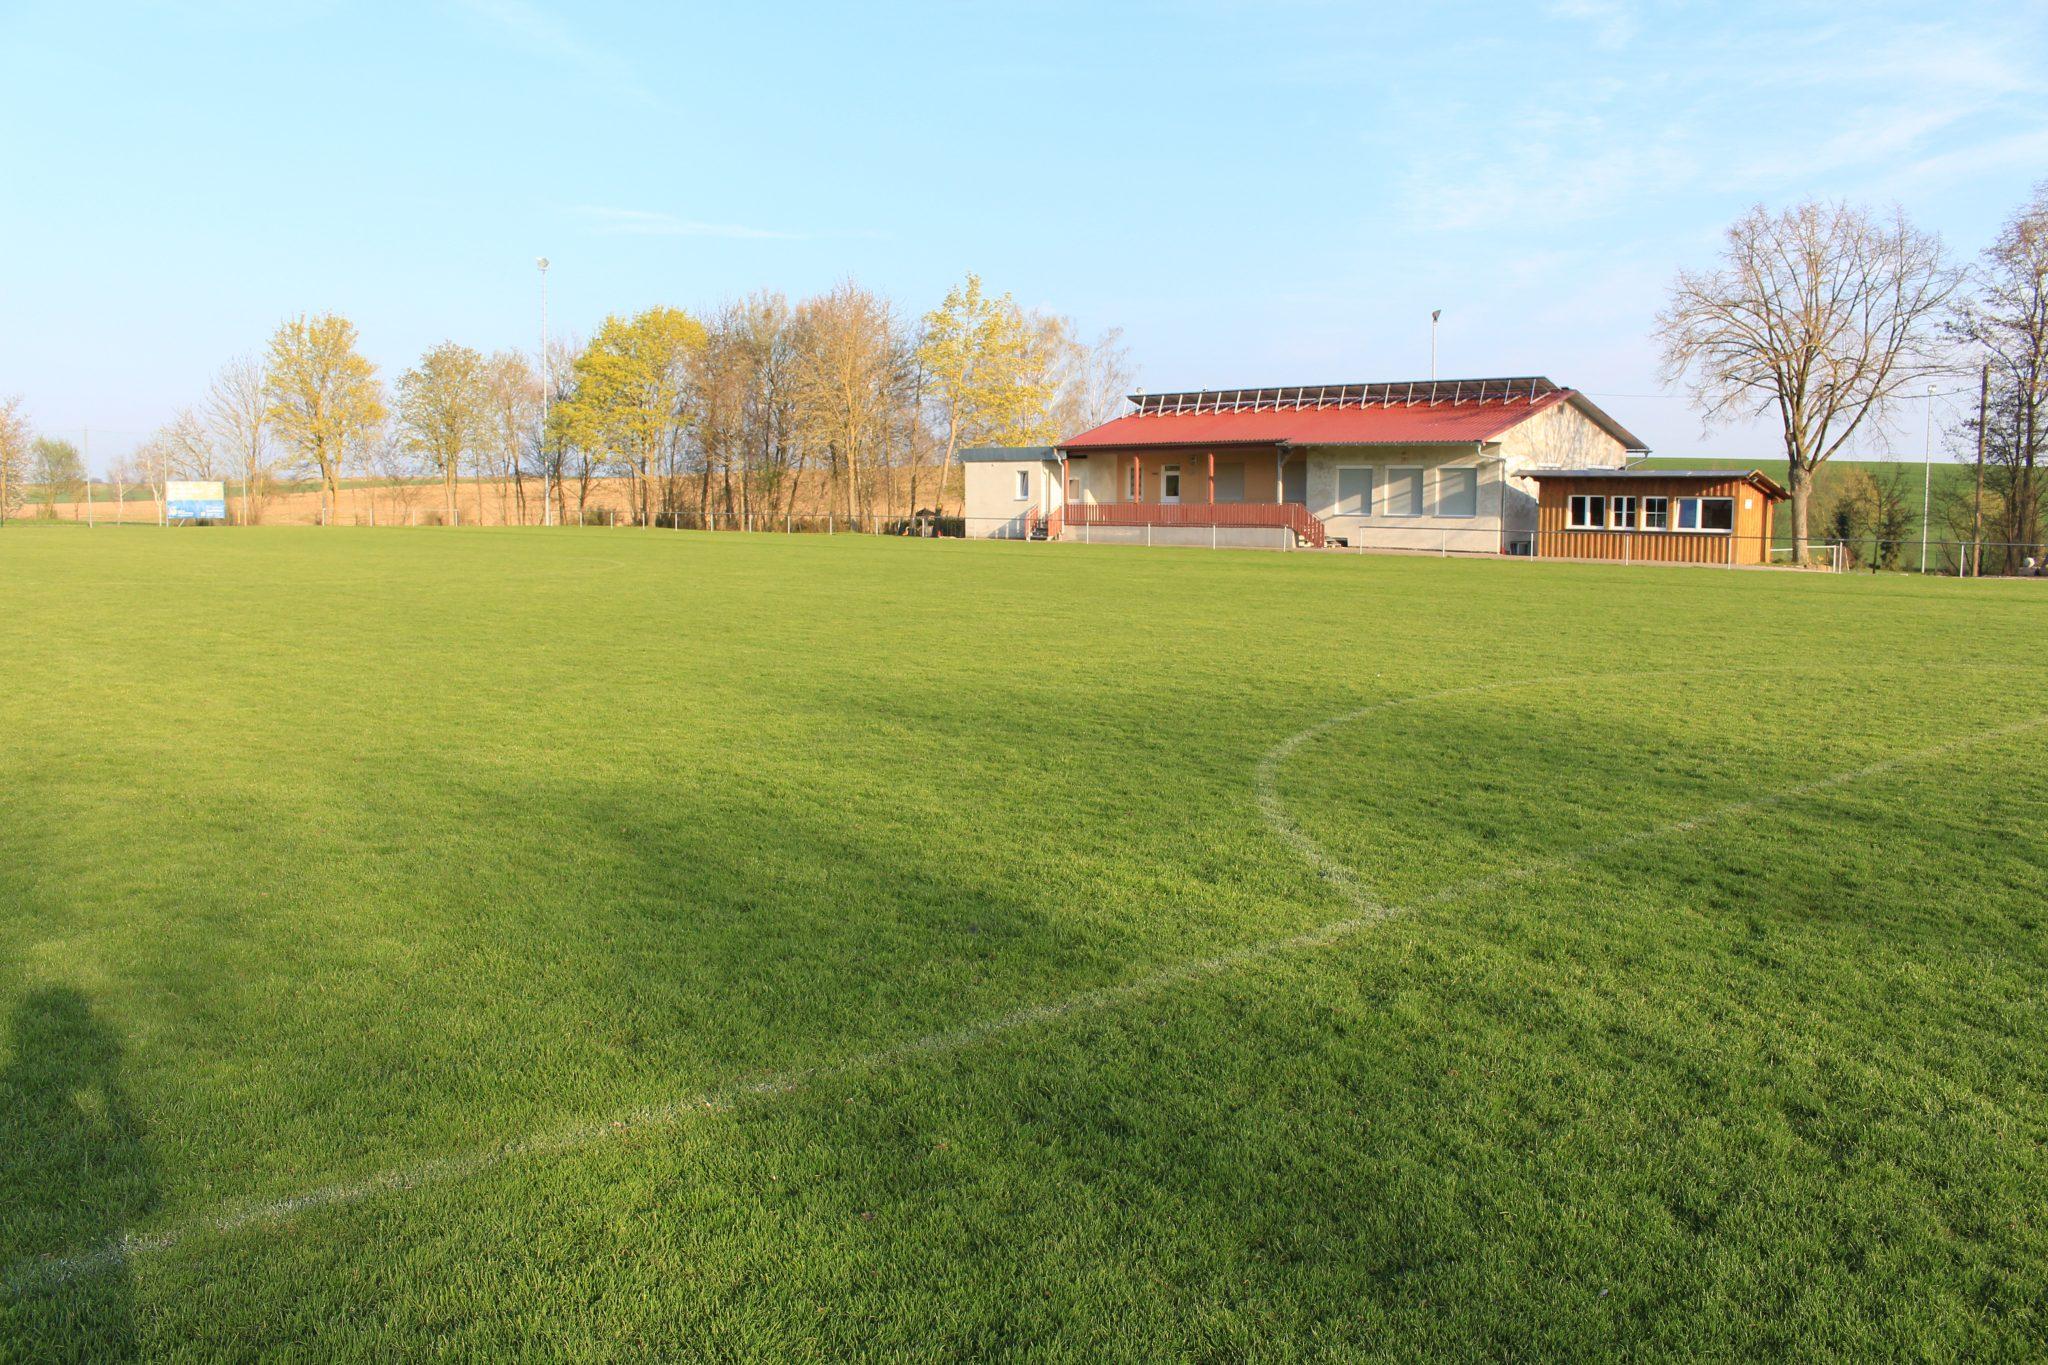 FC Hopferstadt Sportgelände hauptplatz-3